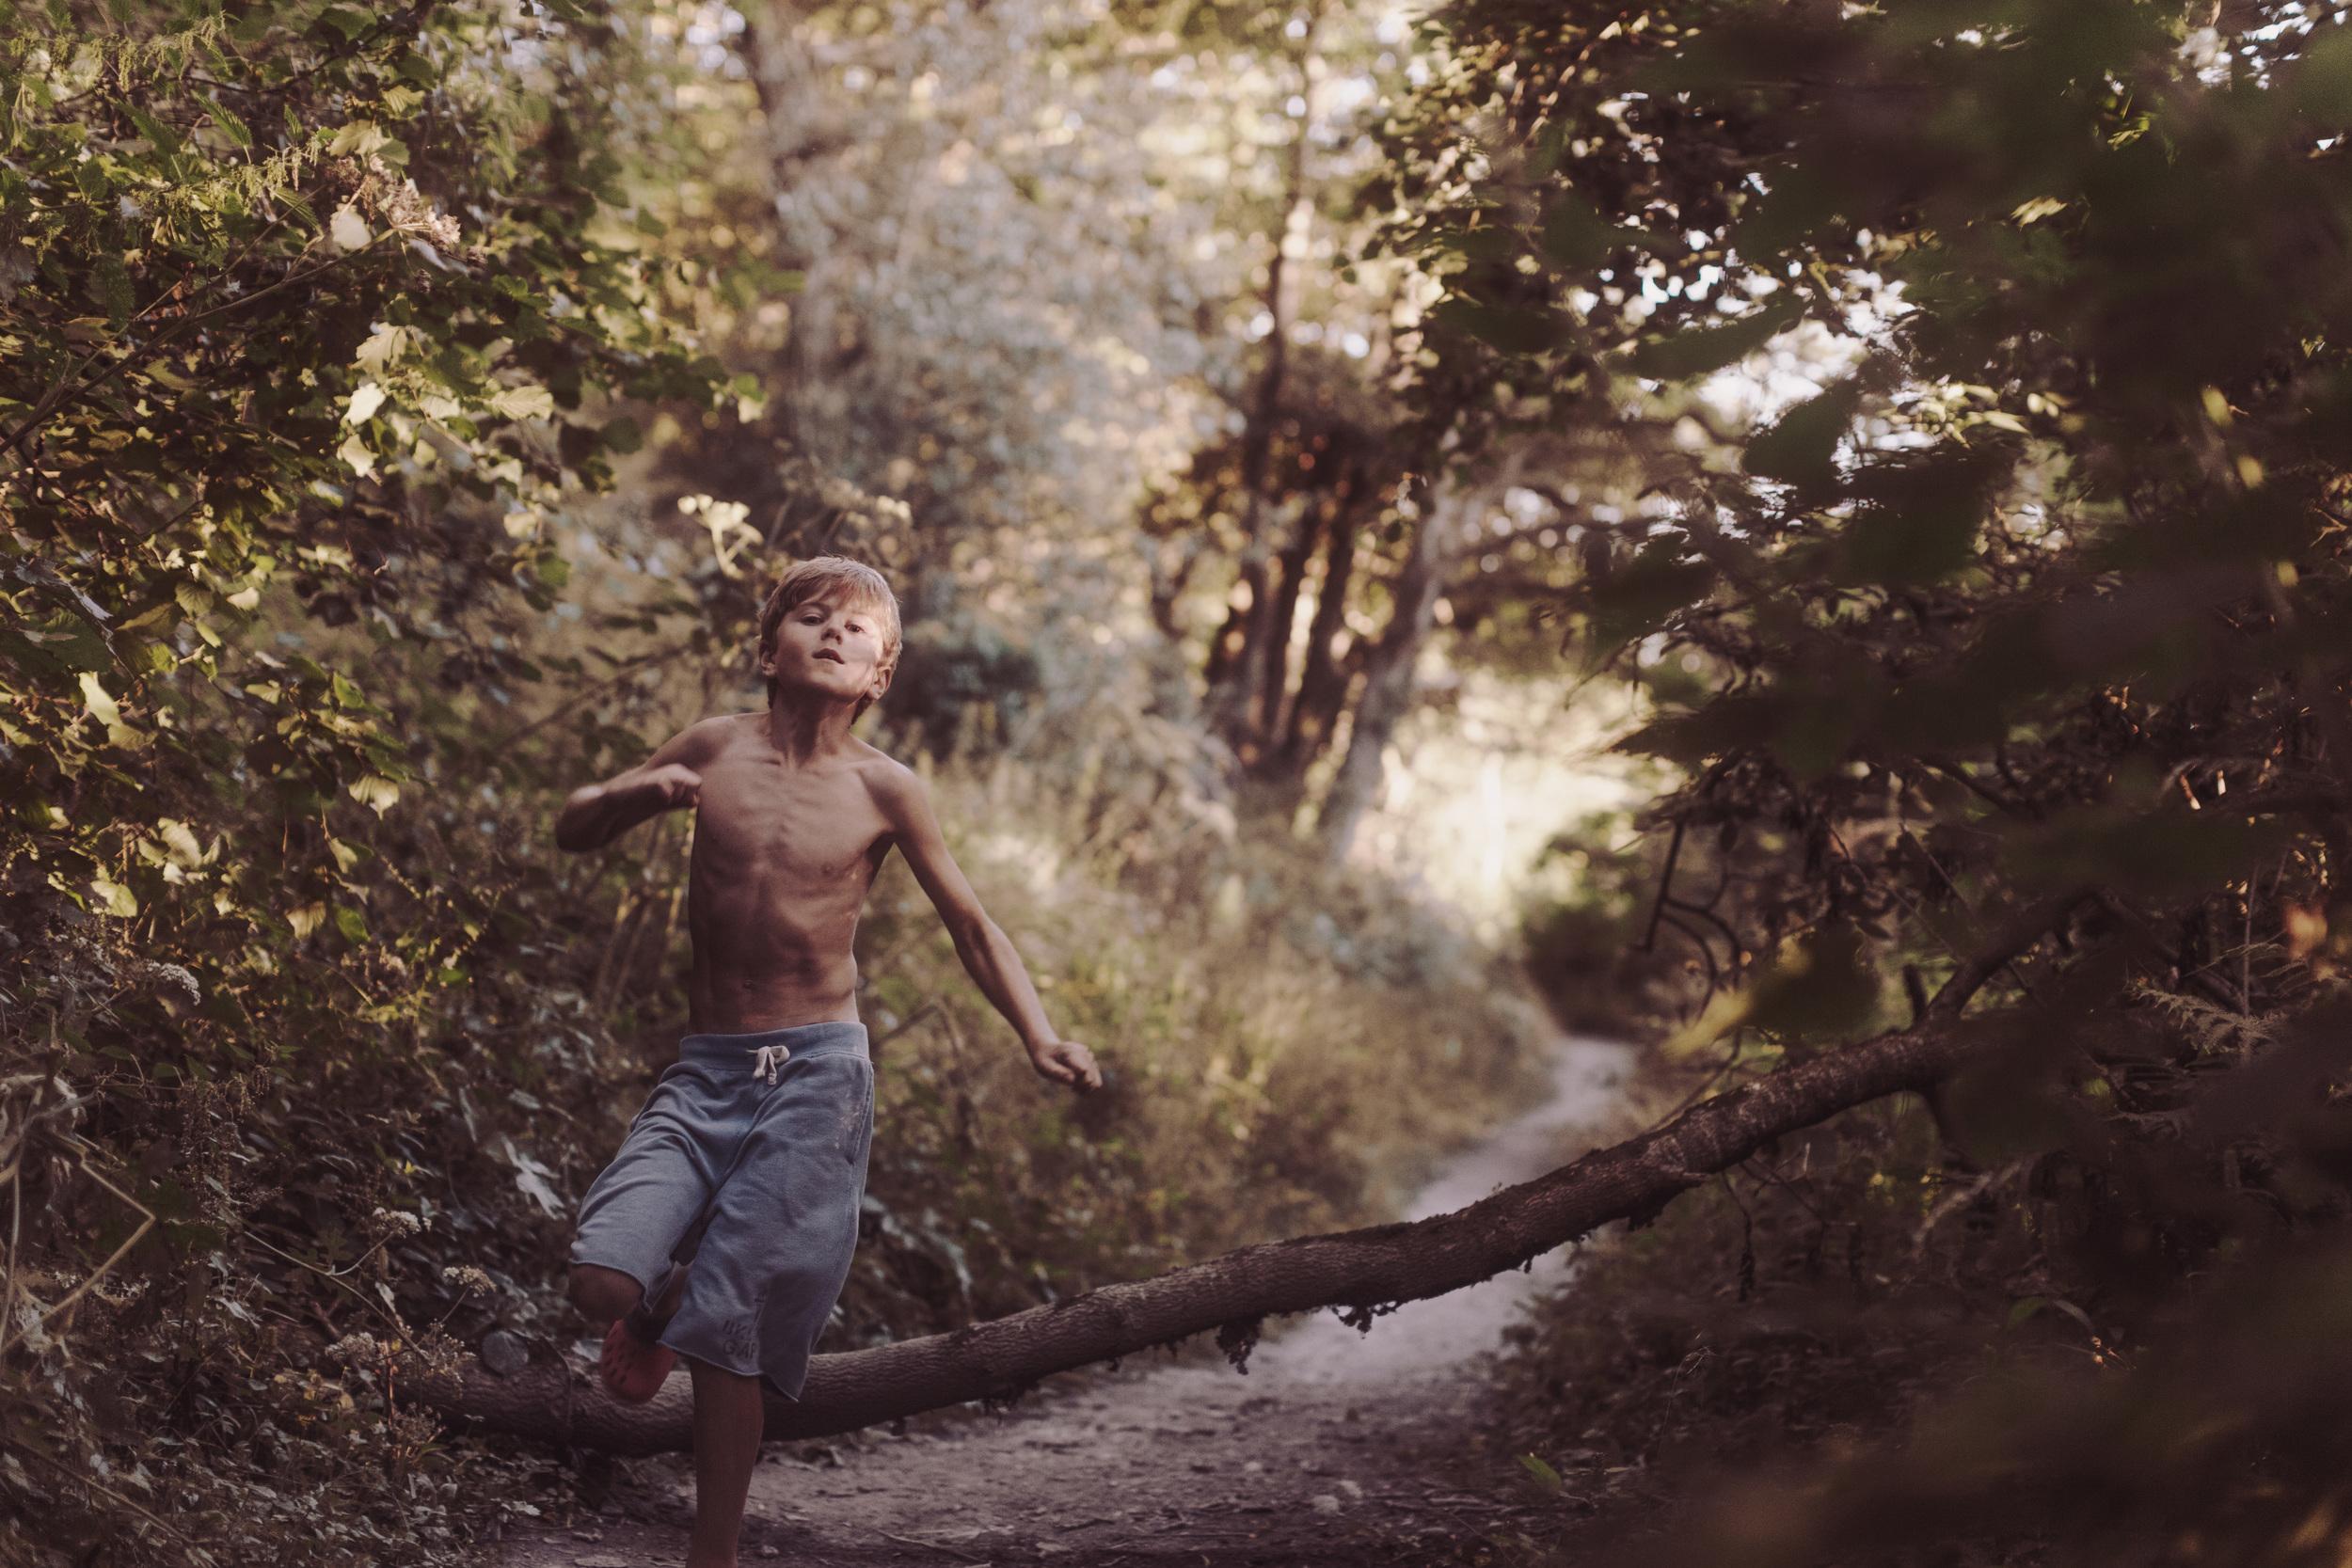 Boyhood_Philip_E_James_1.jpg